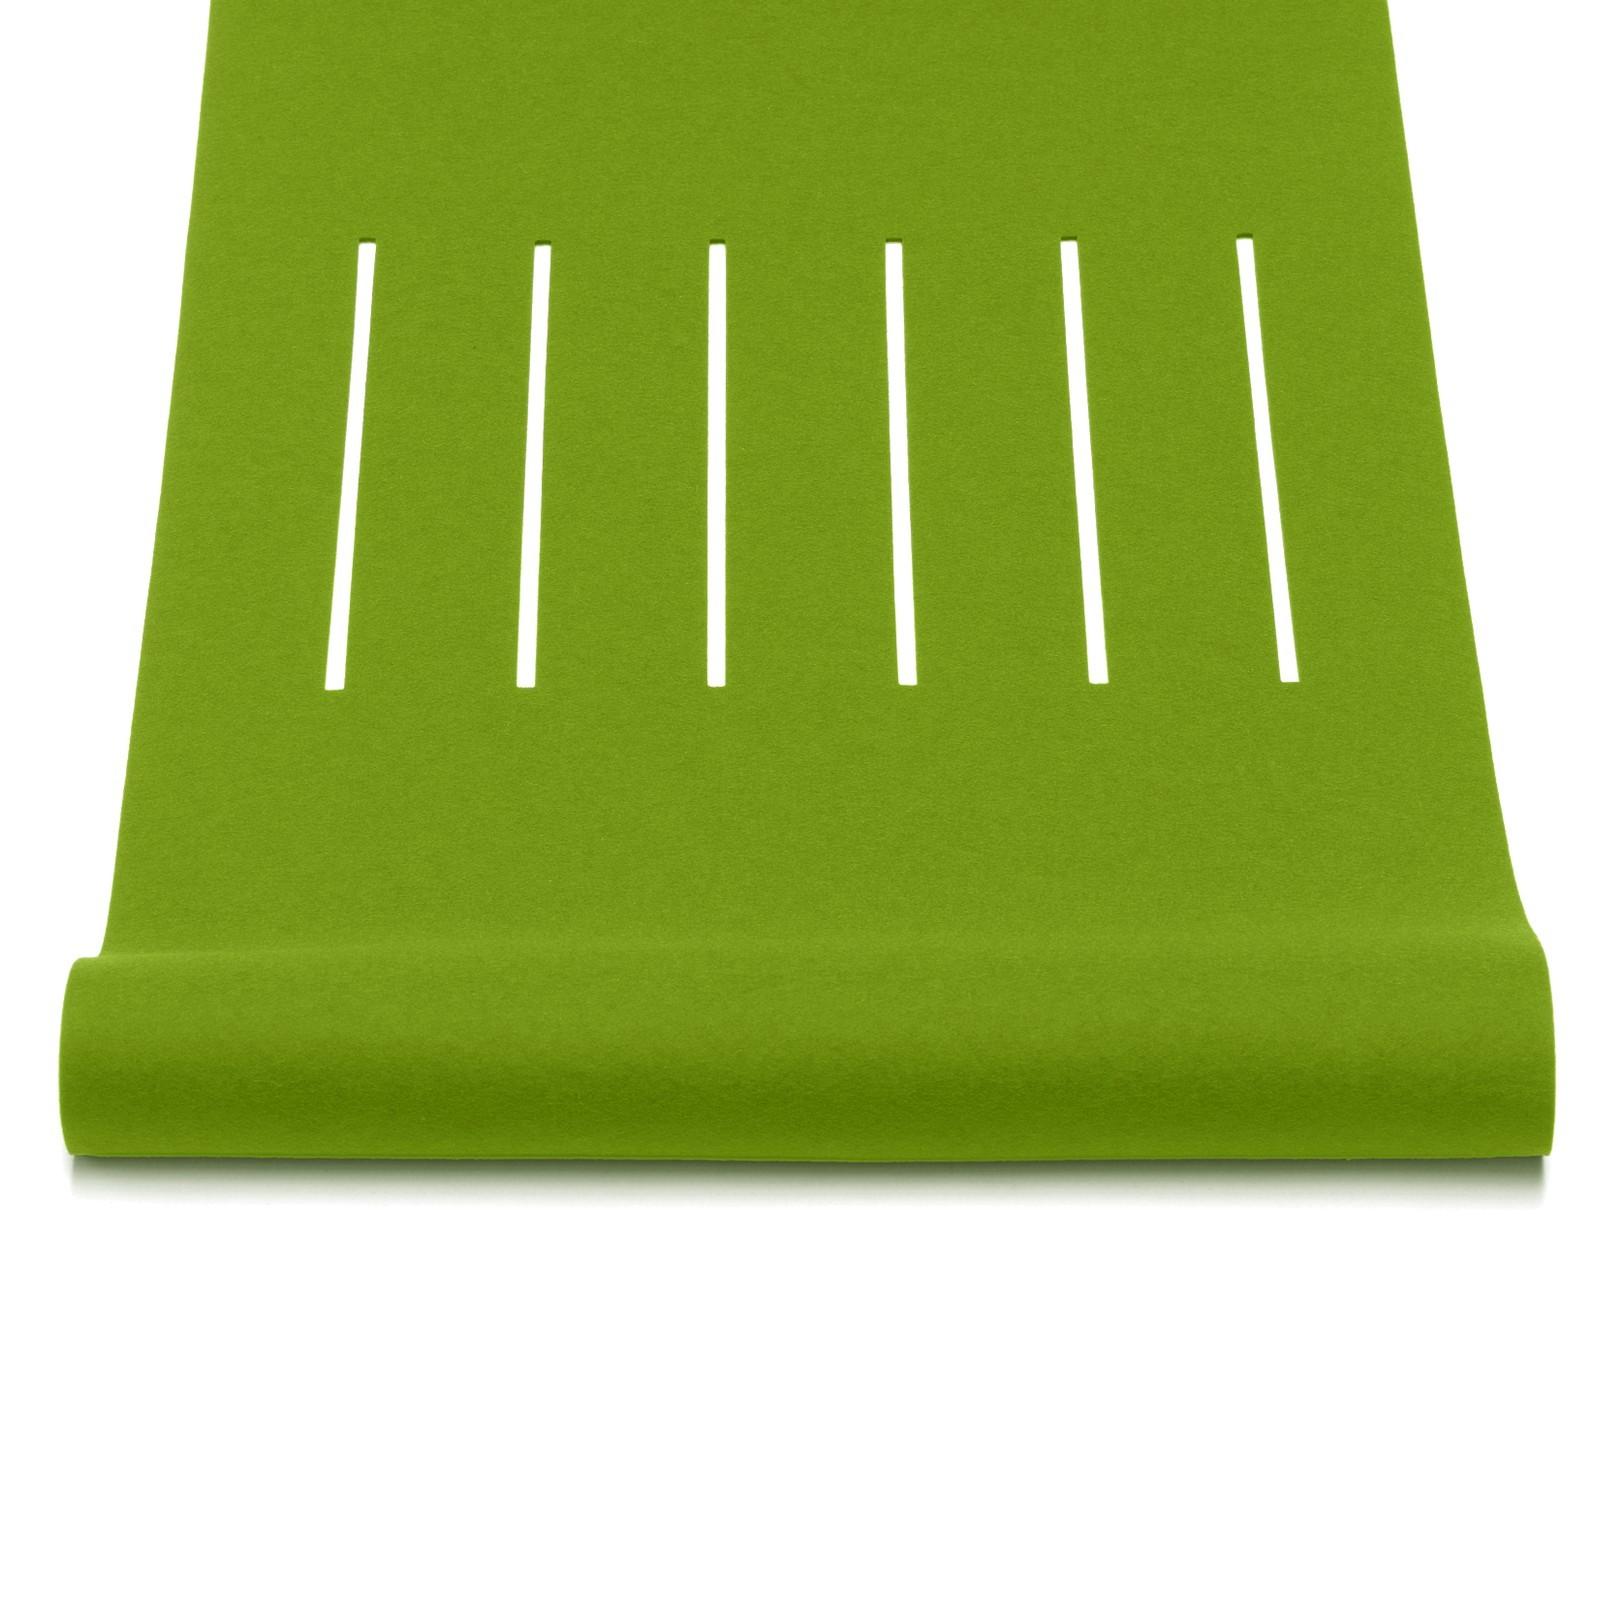 tischl ufer filz geschlitzt viele farben gr en hey sign. Black Bedroom Furniture Sets. Home Design Ideas